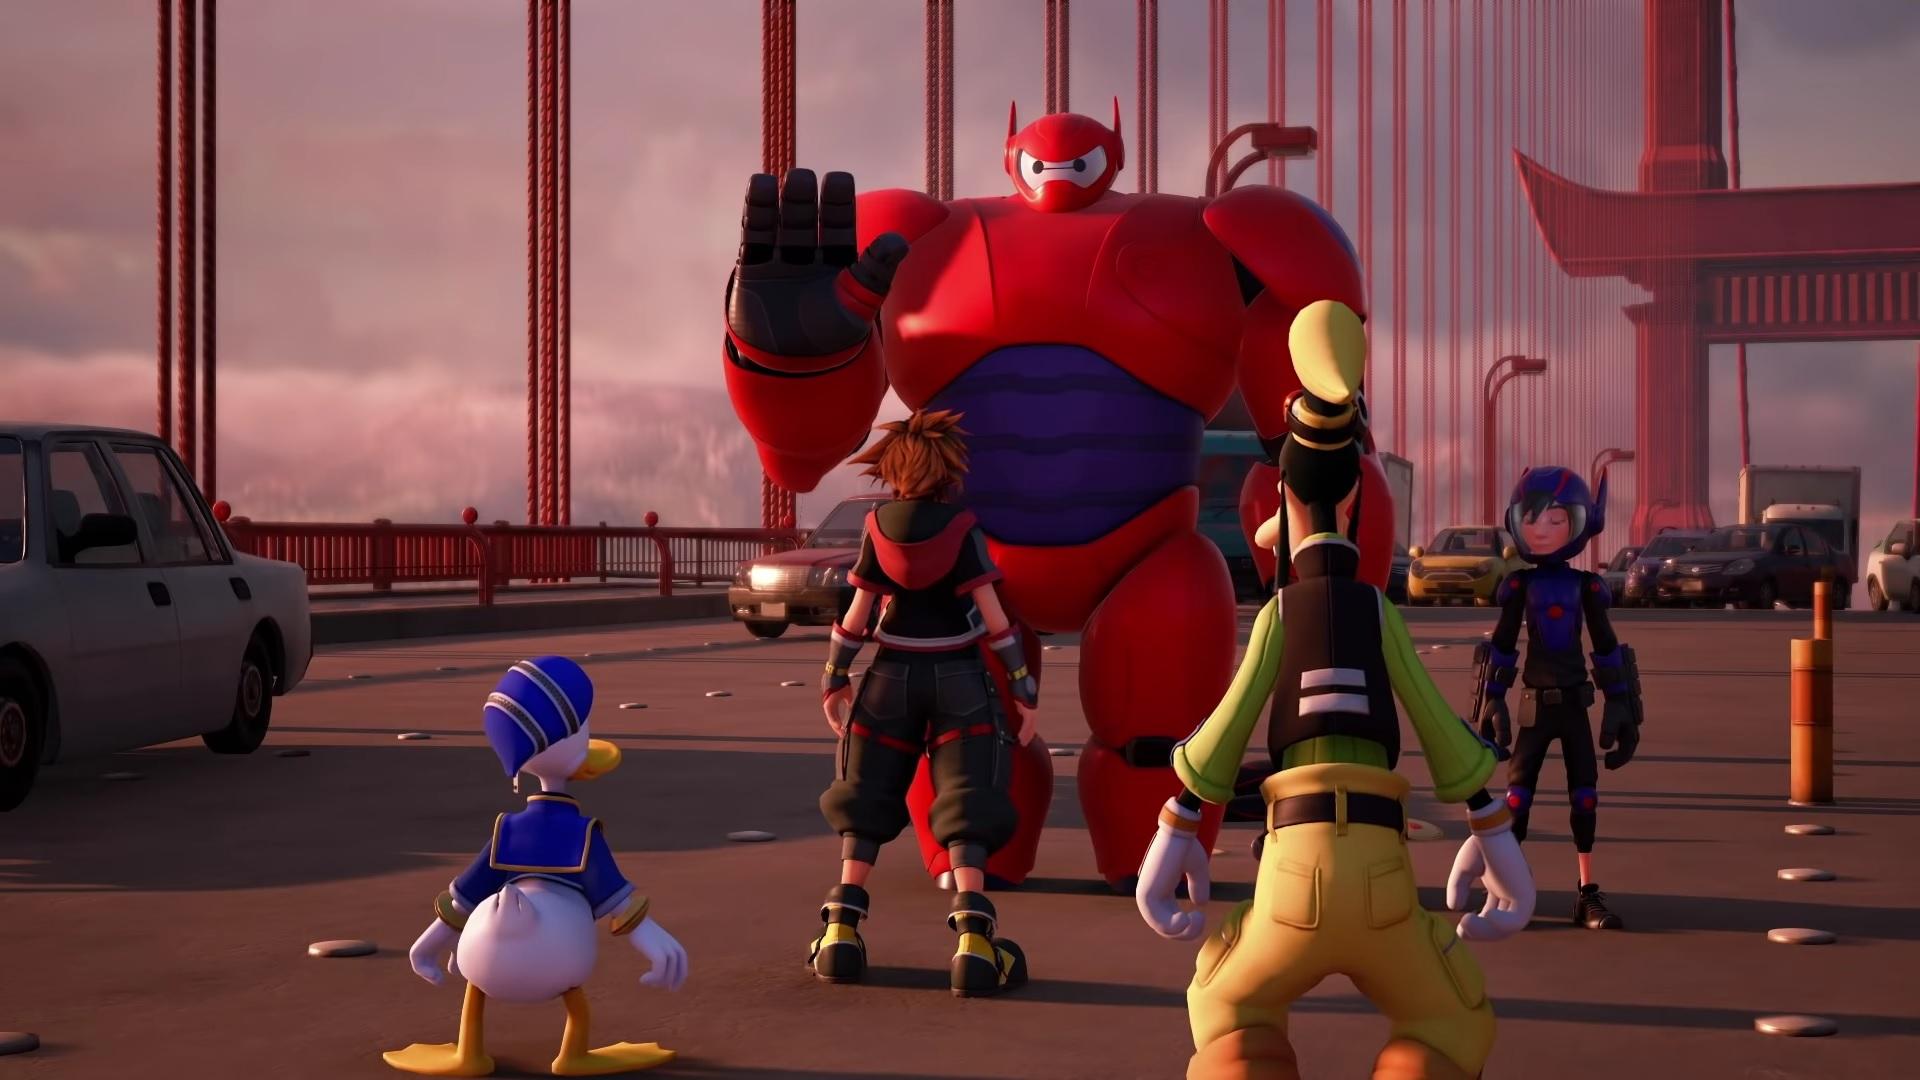 Here's a good look at Kingdom Hearts III's Big Hero 6 world screenshot